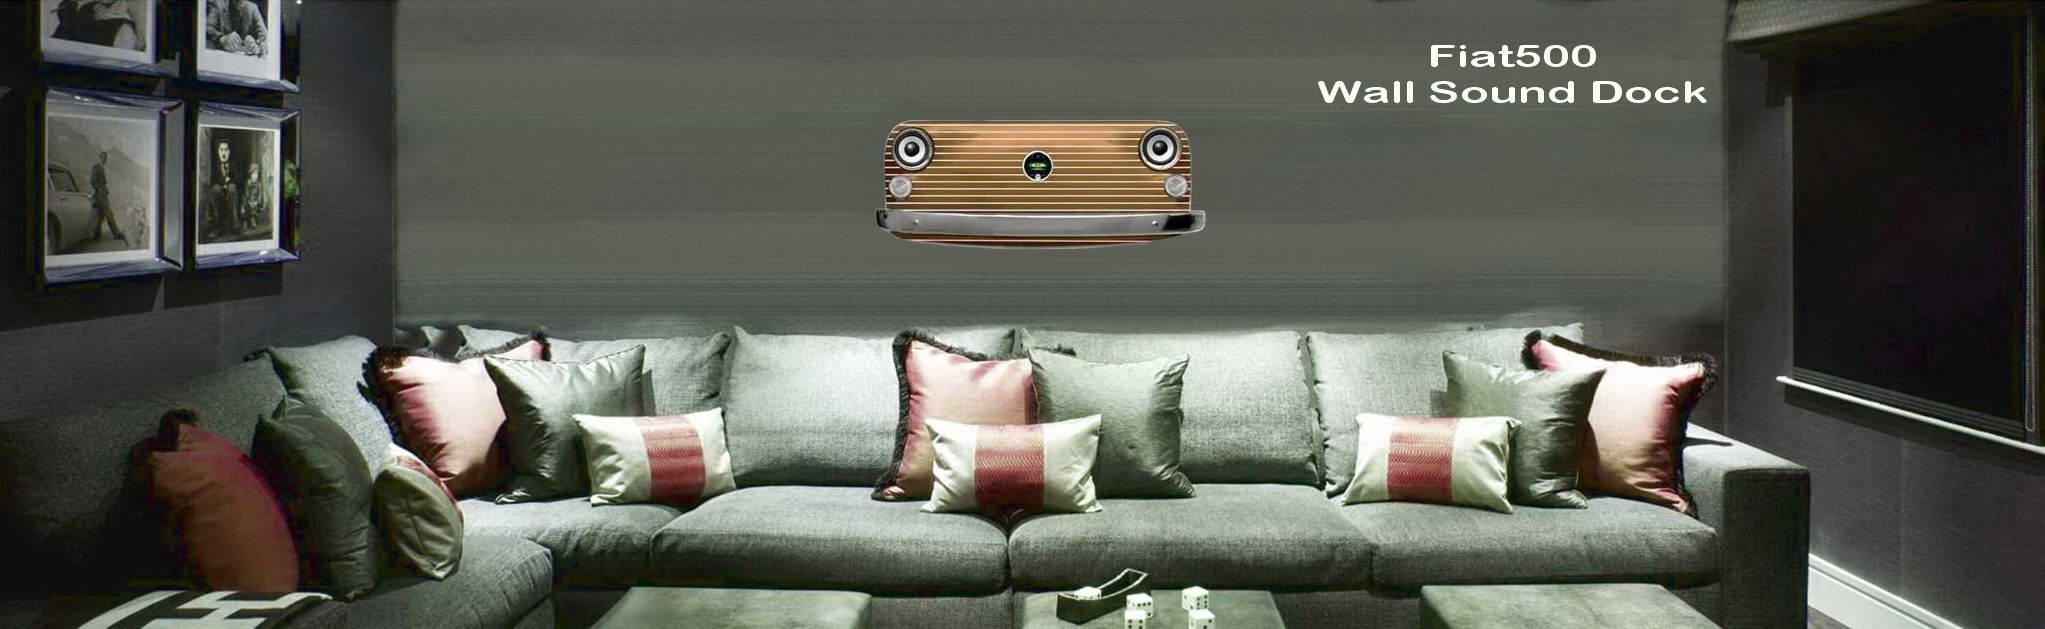 Banner-Fiat500-Wall-Sound-Dock